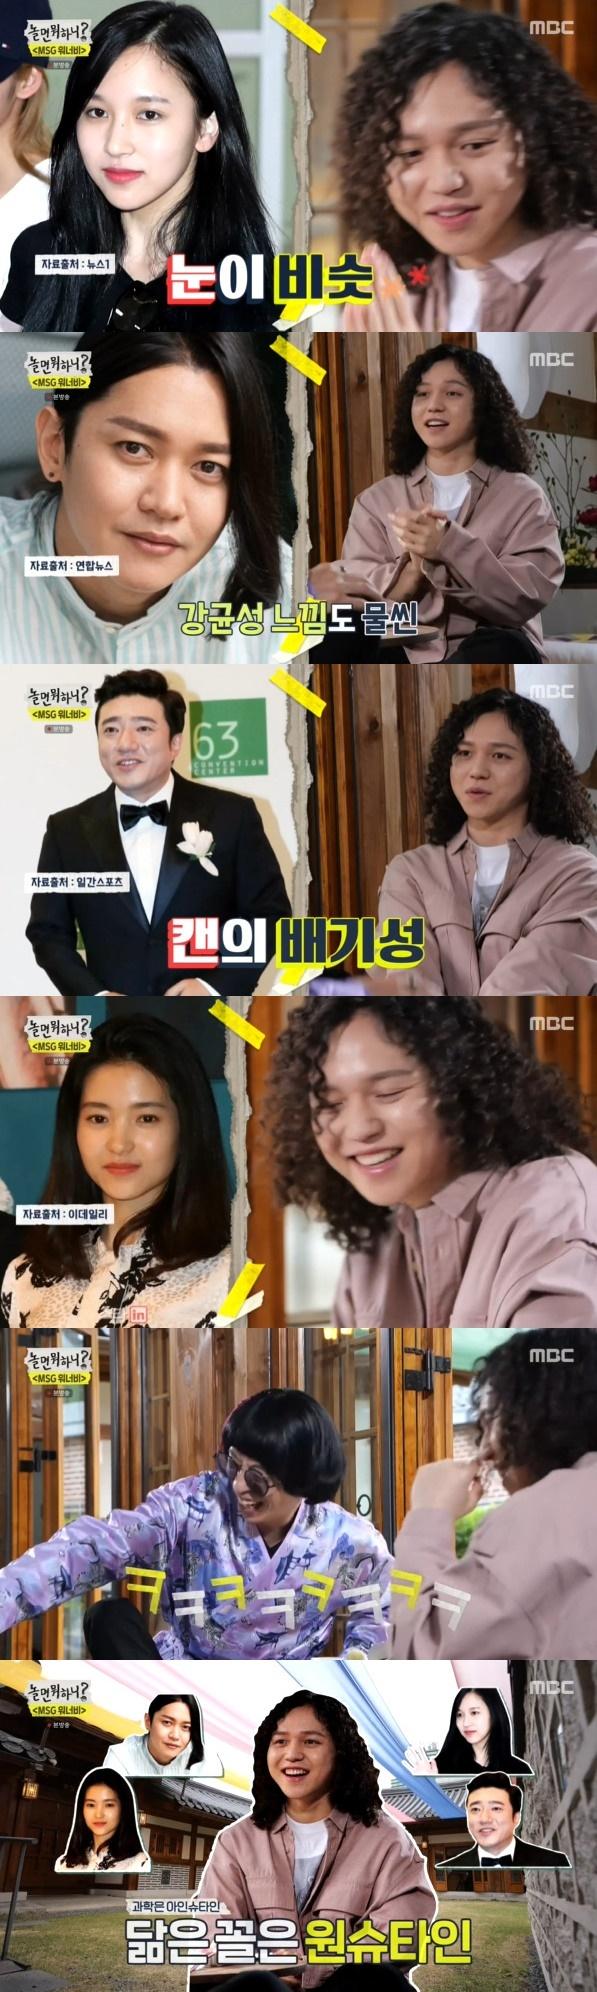 MBC '놀면 뭐하니?' 방송 화면 캡처 © 뉴스1